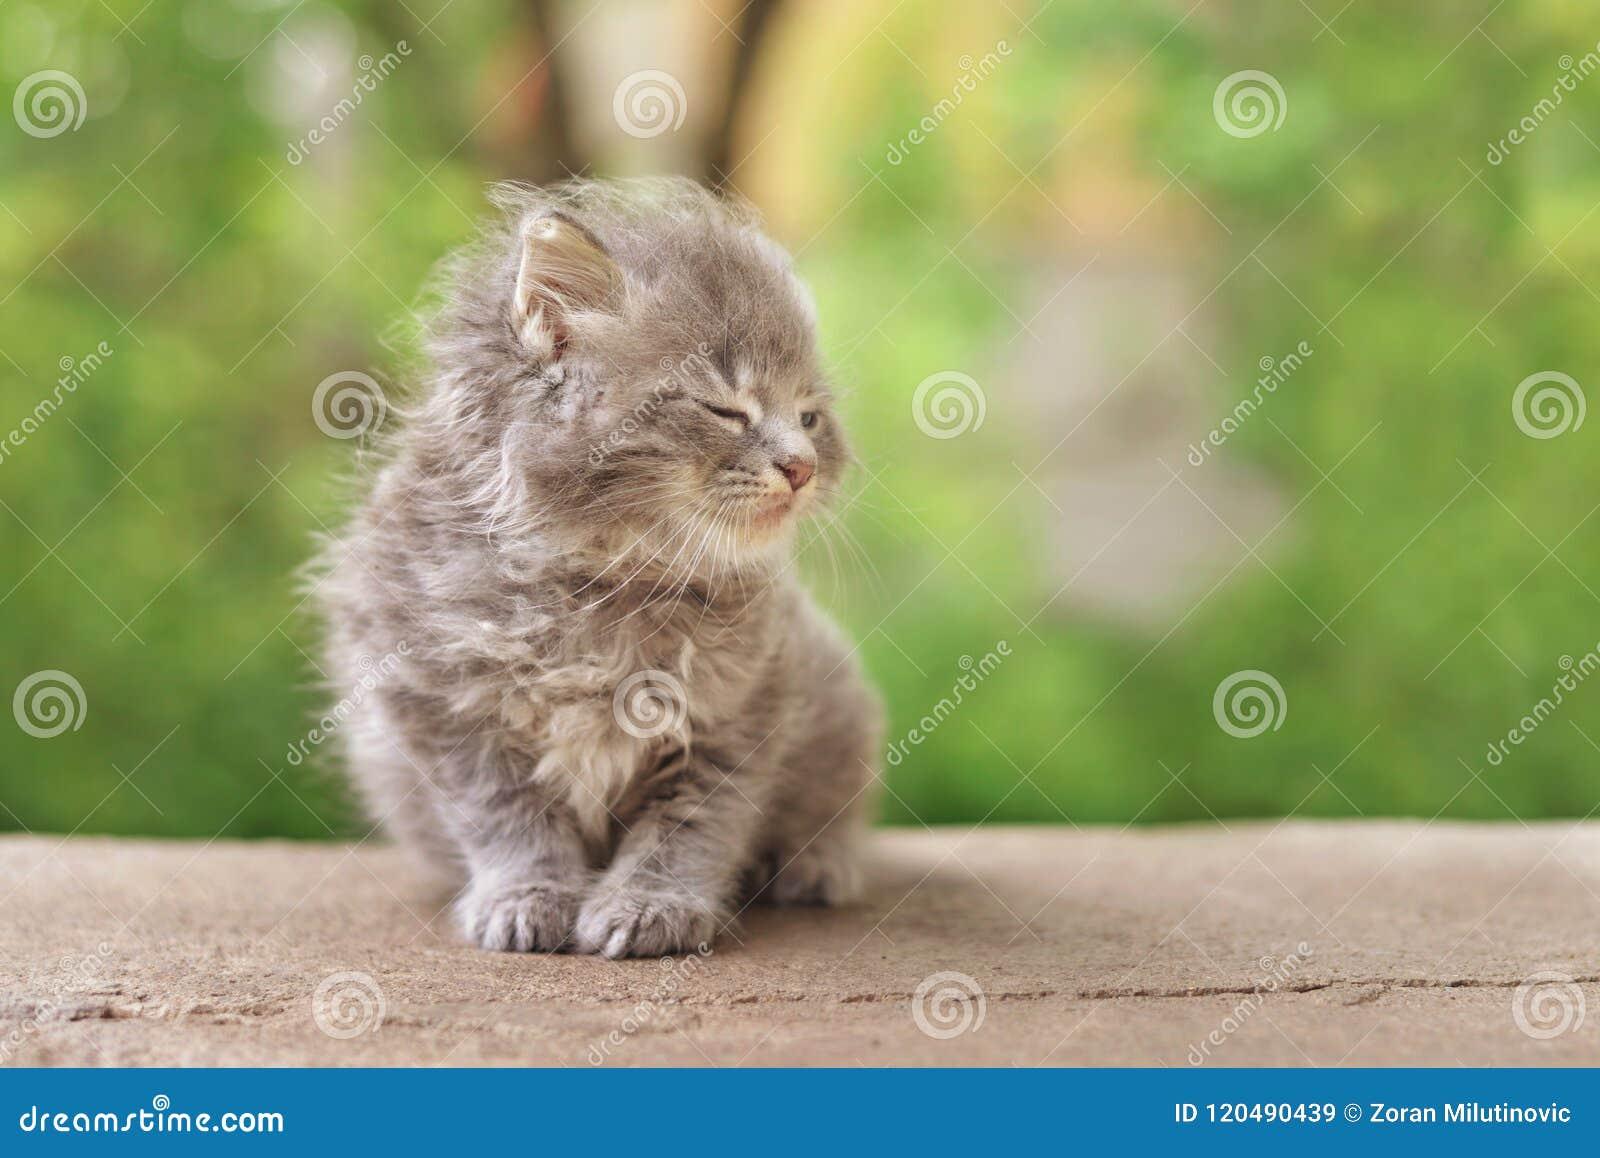 Очень милый пушистый котенок